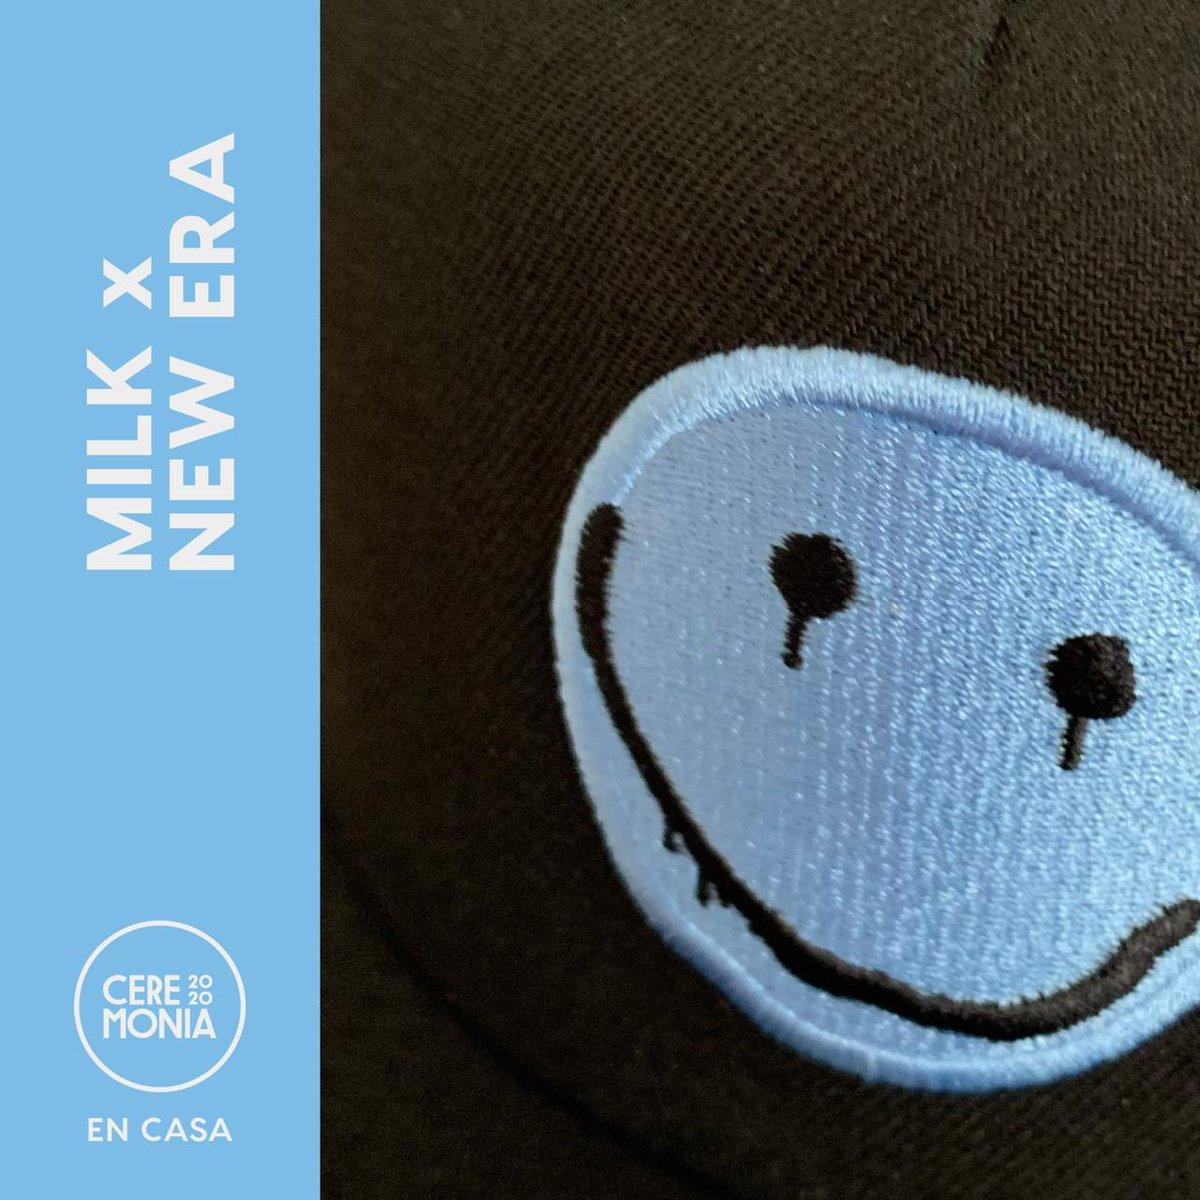 Milk X @NewEraMx  X @CeremoniaFest  Todas las ventas serán donadas💙💙 https://t.co/4UD9nUvkqR https://t.co/UsYOtuGw0N